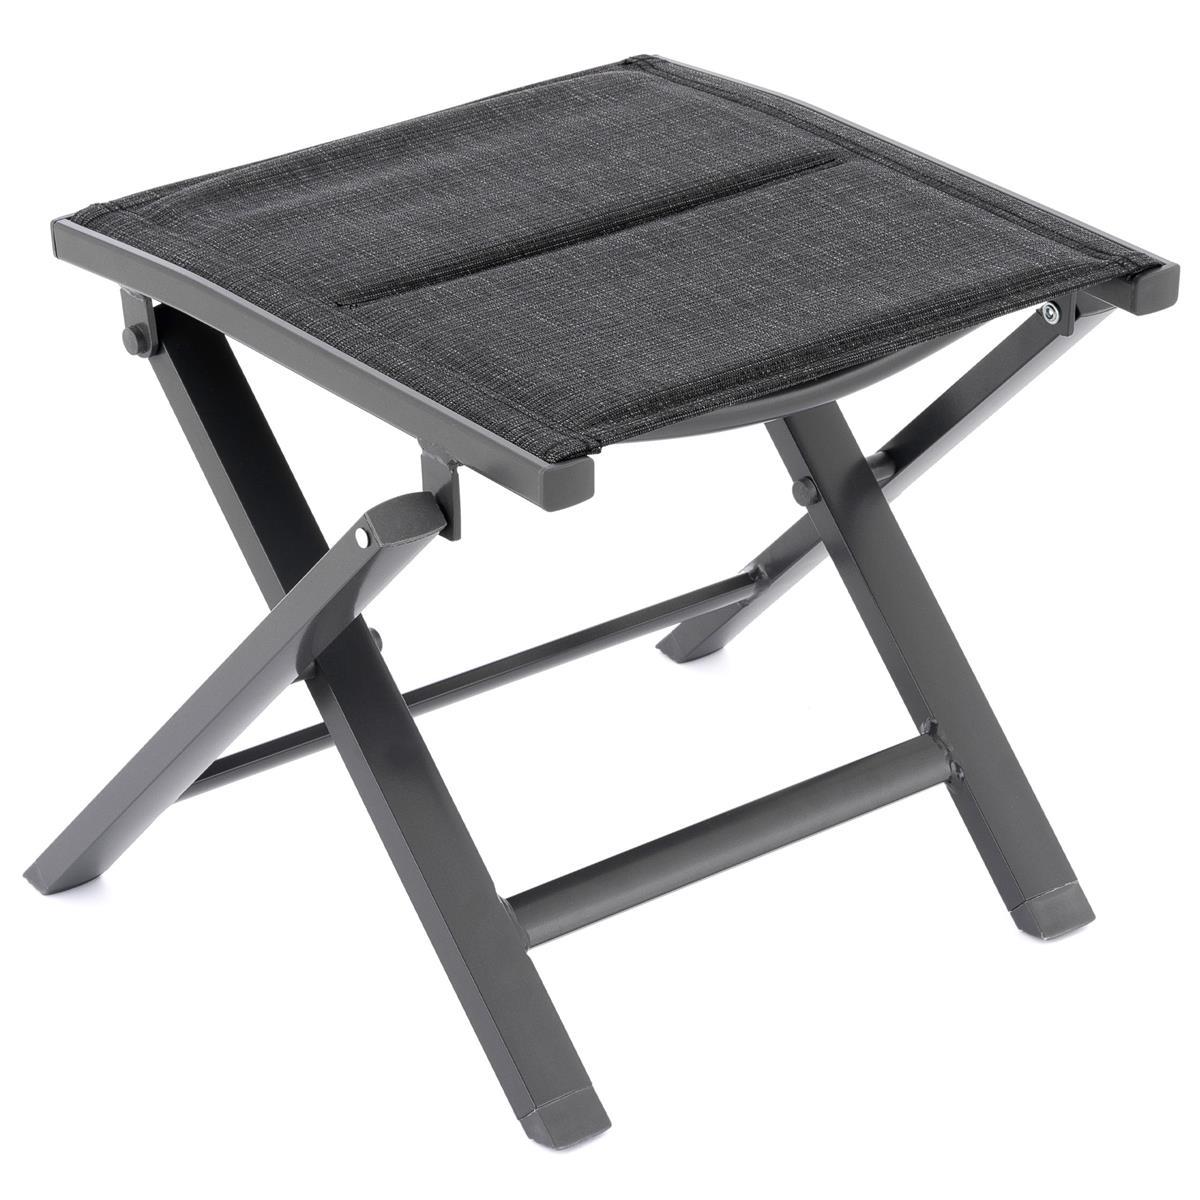 klappbarer Alu Hocker Rahmen grau Olefin schwarz Klapphocker Sitzhocker Camping